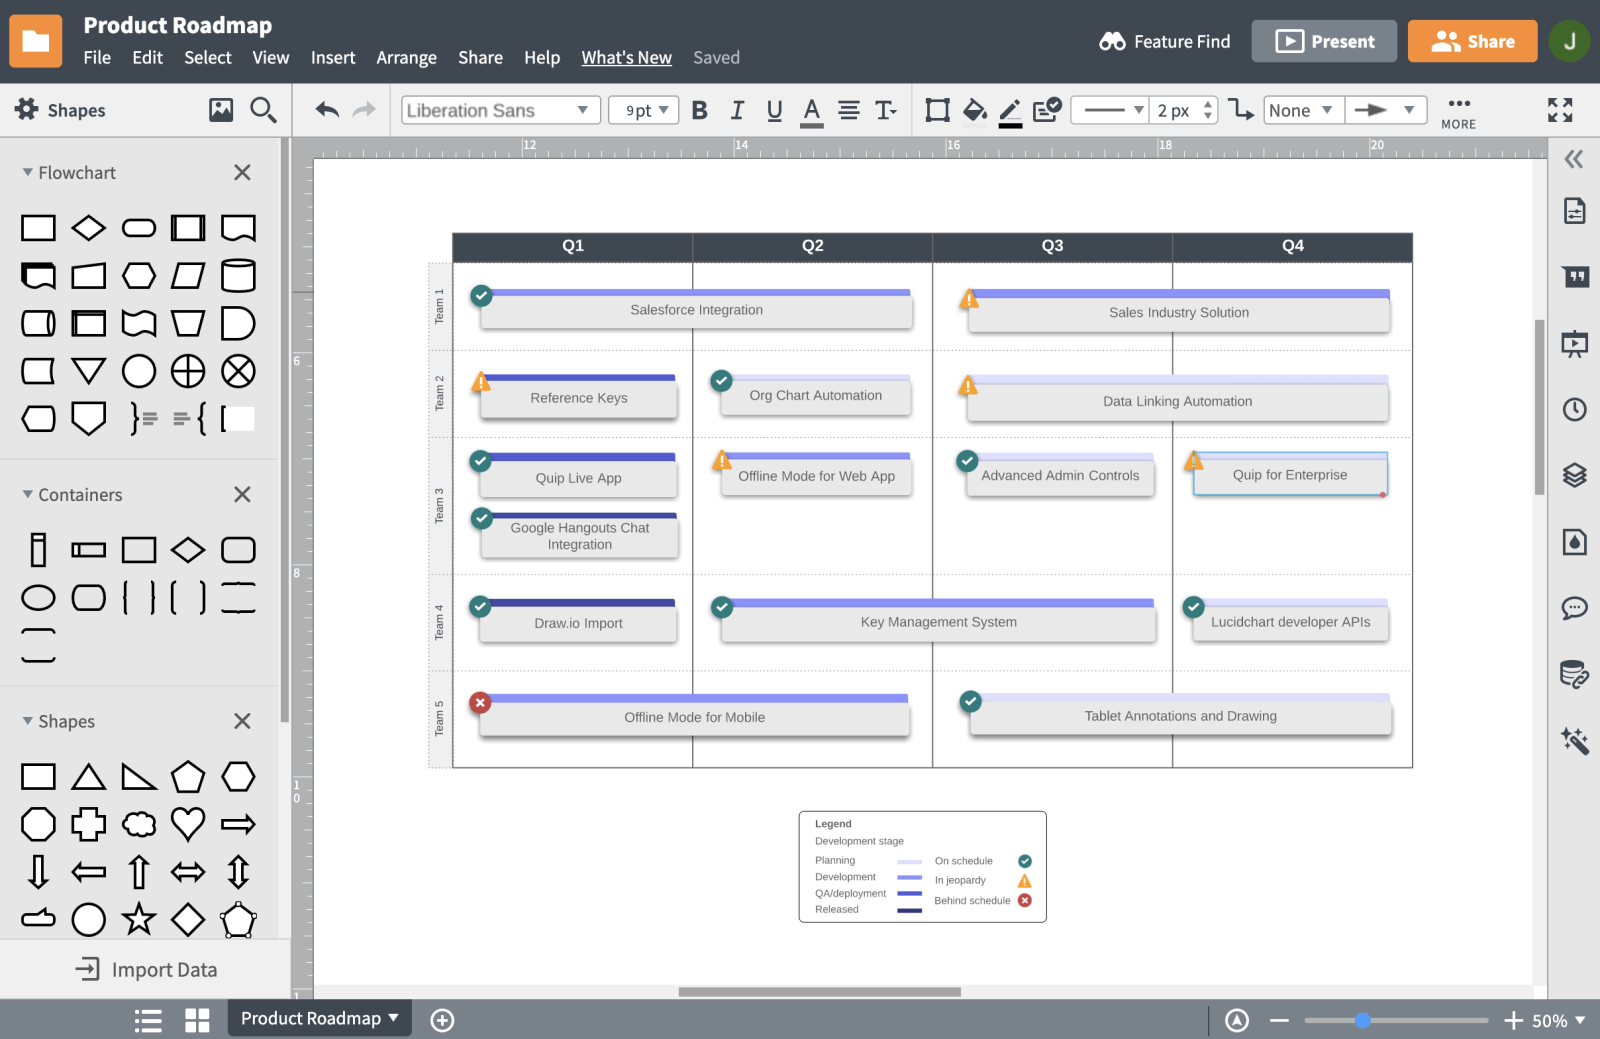 Roadmap de desenvolvimento de produtos online do Lucidchart